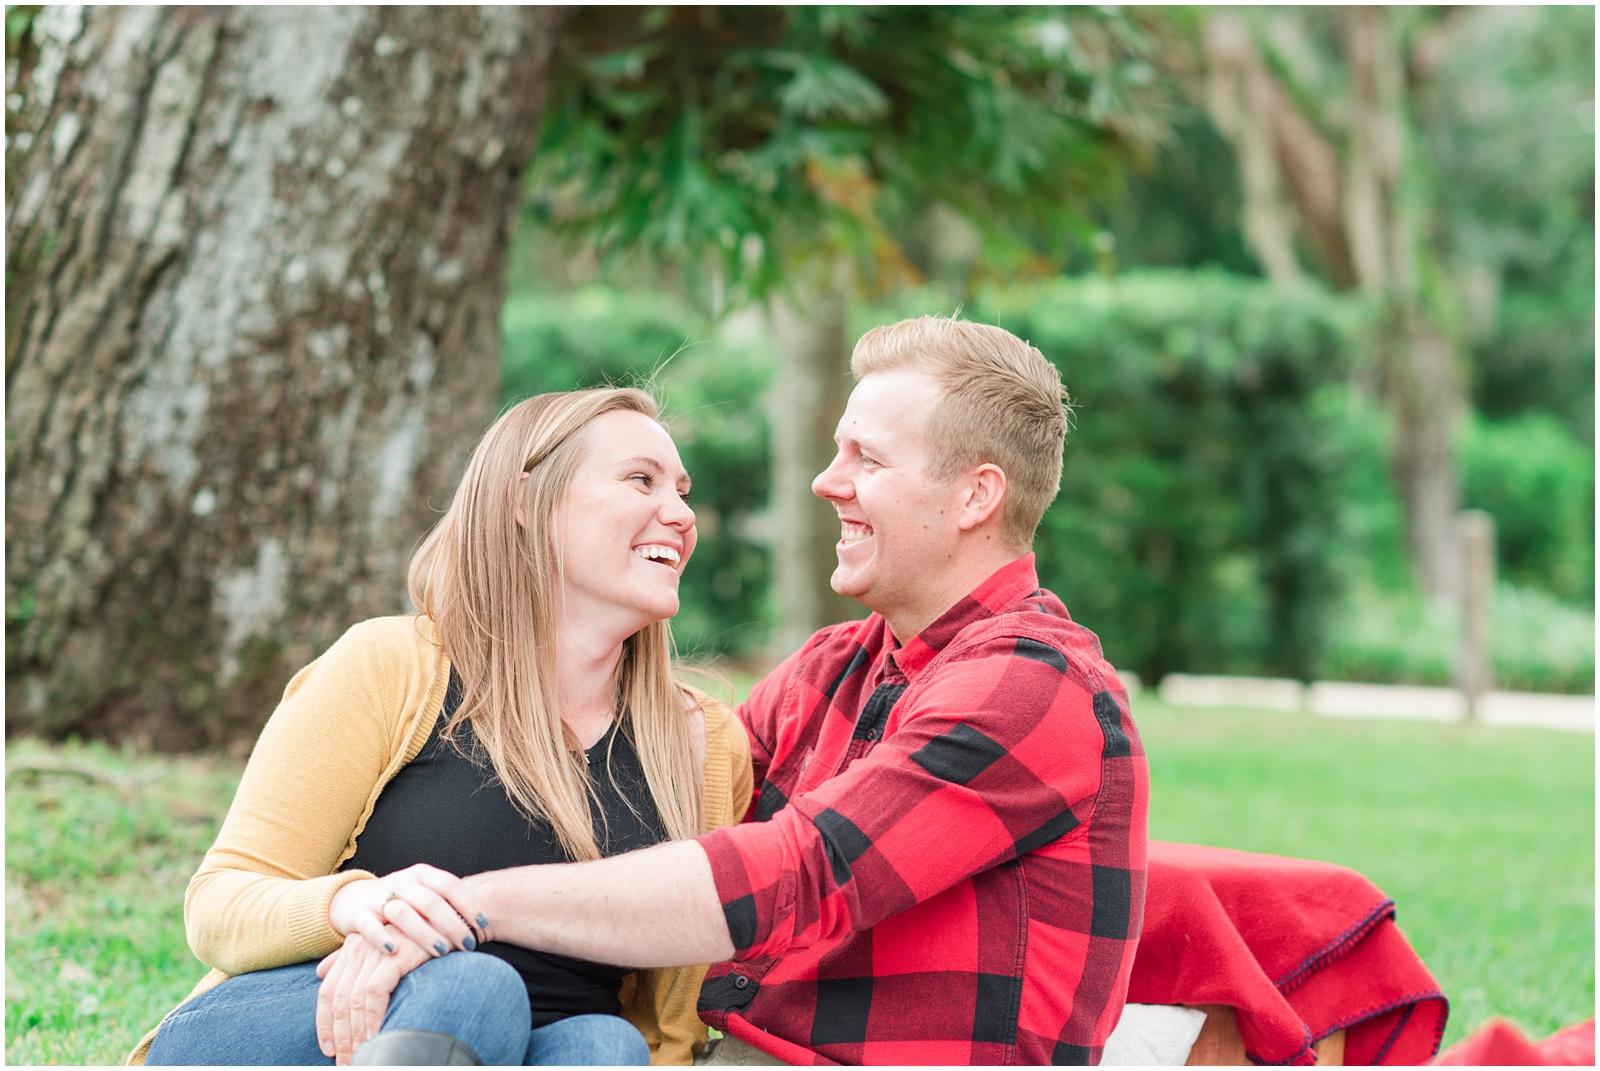 Palm Coast_Washington Oaks Garden_State Park_Engagement_Portraits_22.jpg